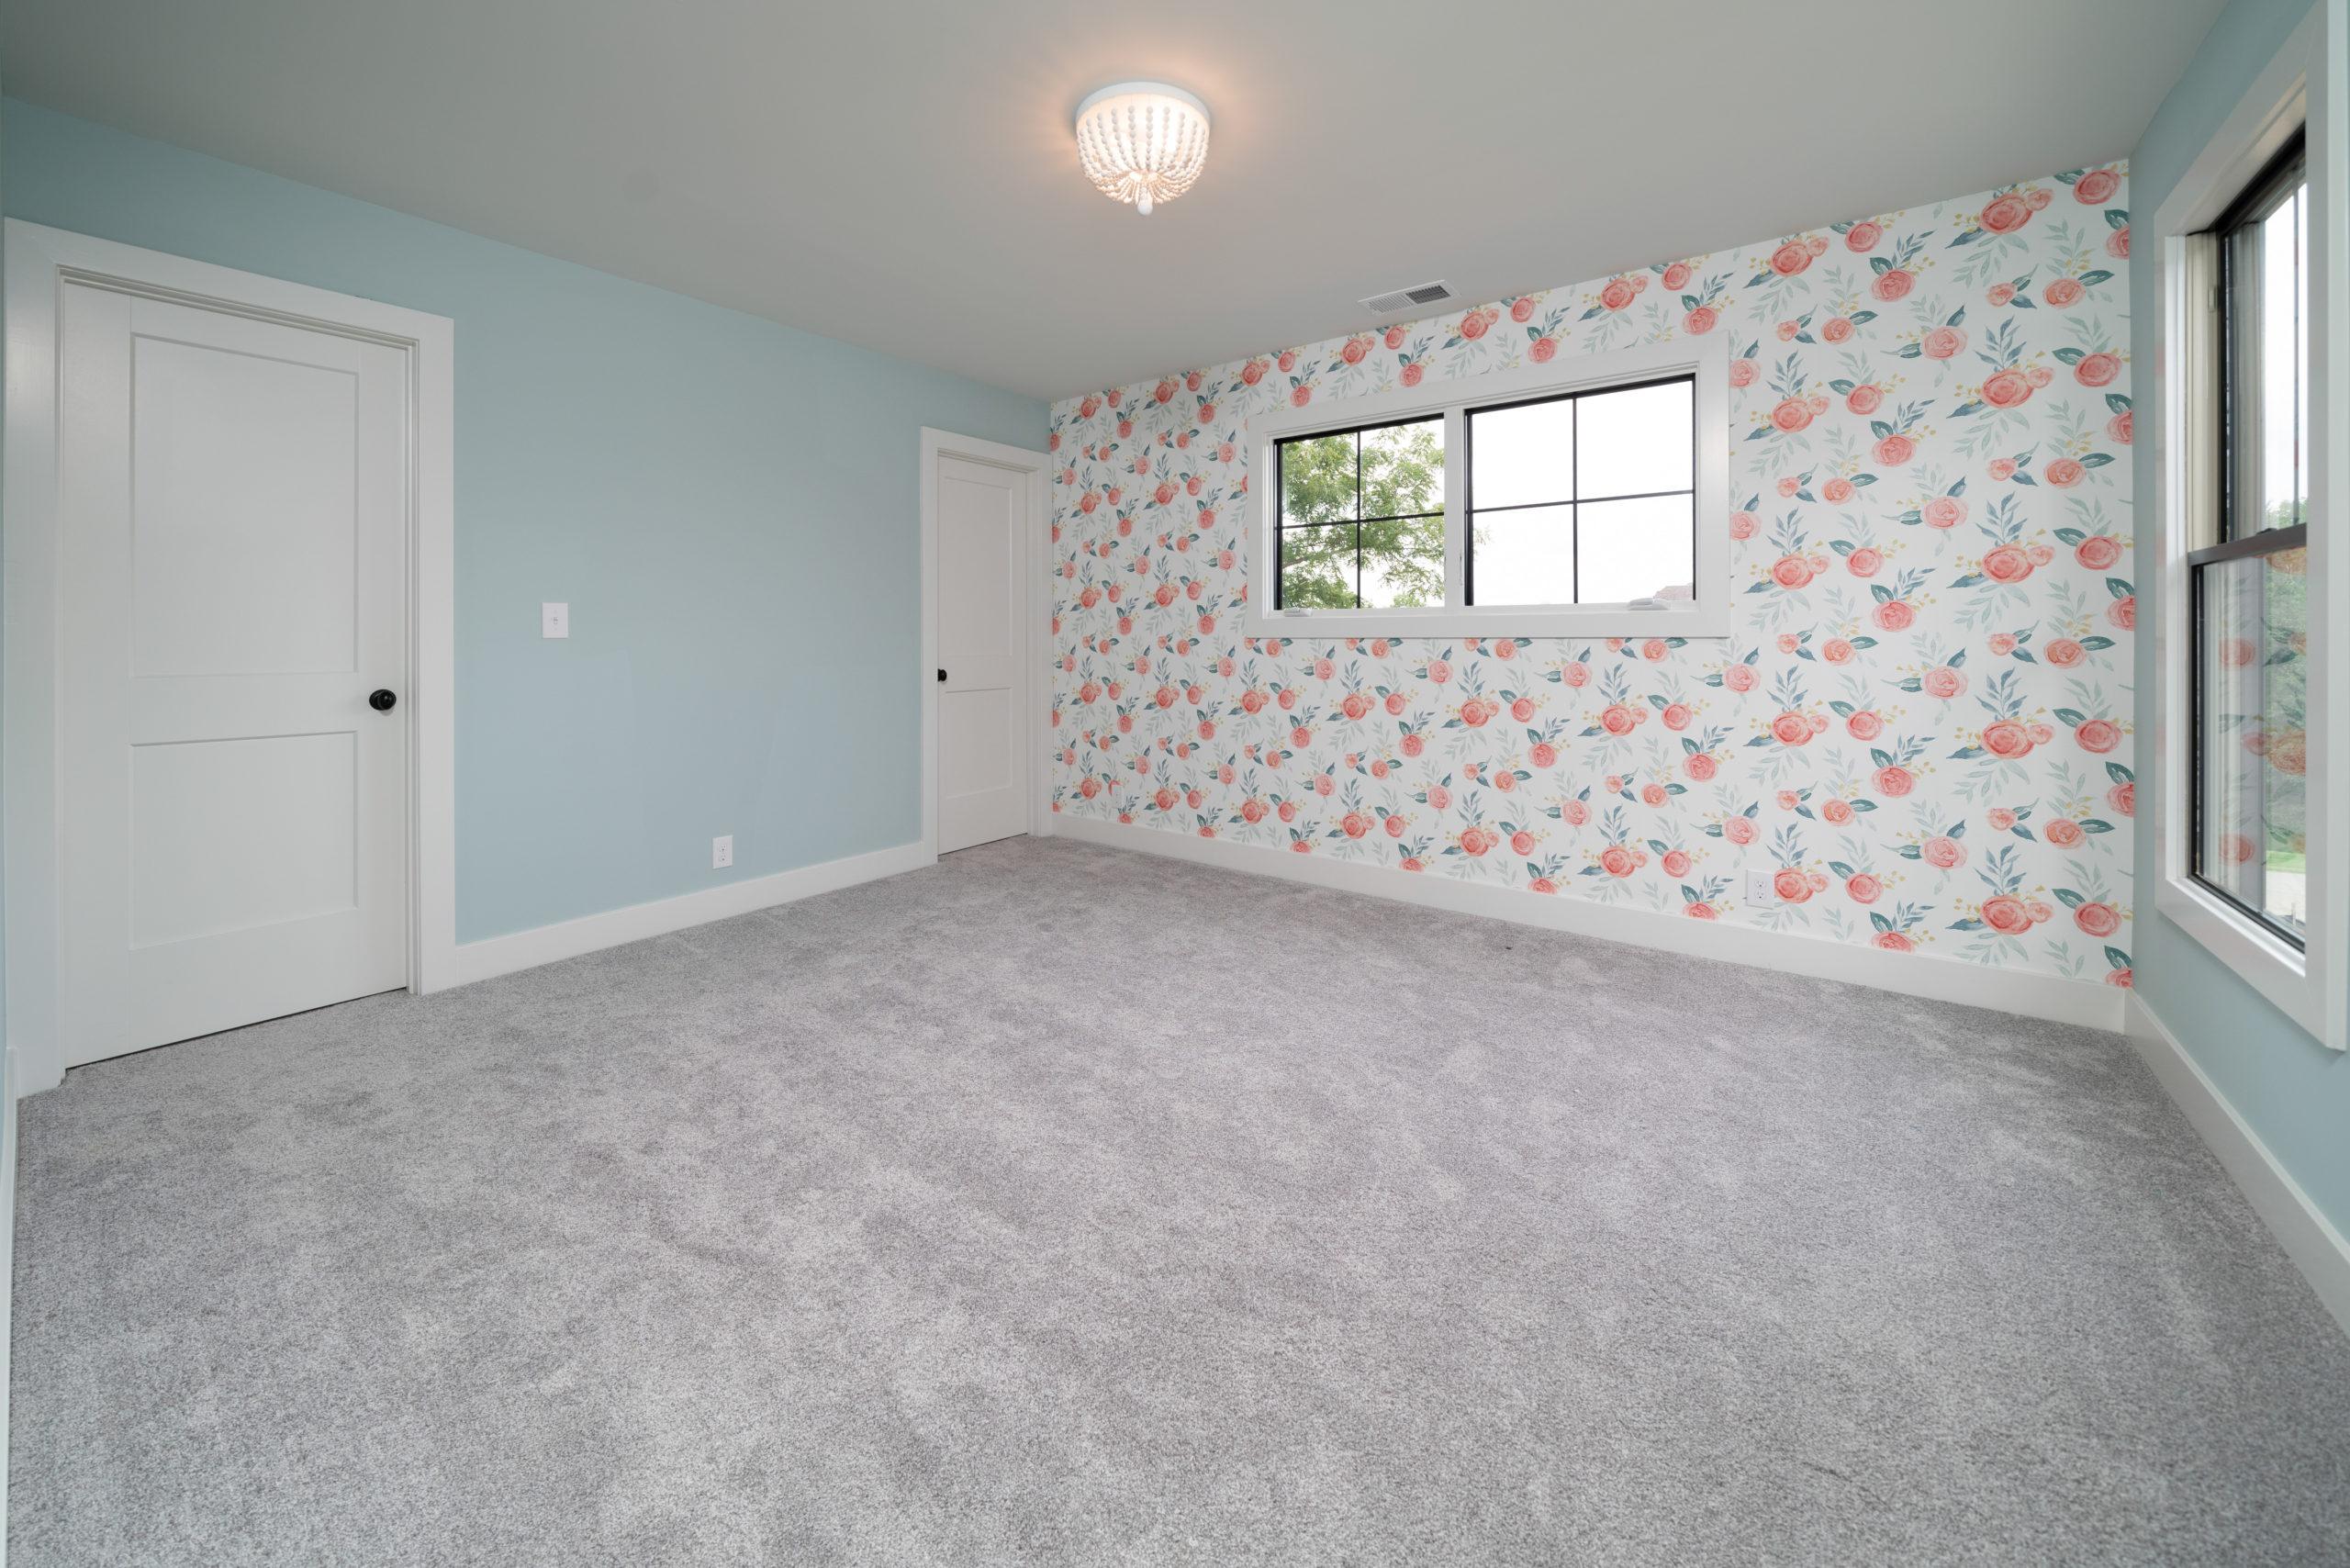 flower wallpaper accent wall in girls bedroom